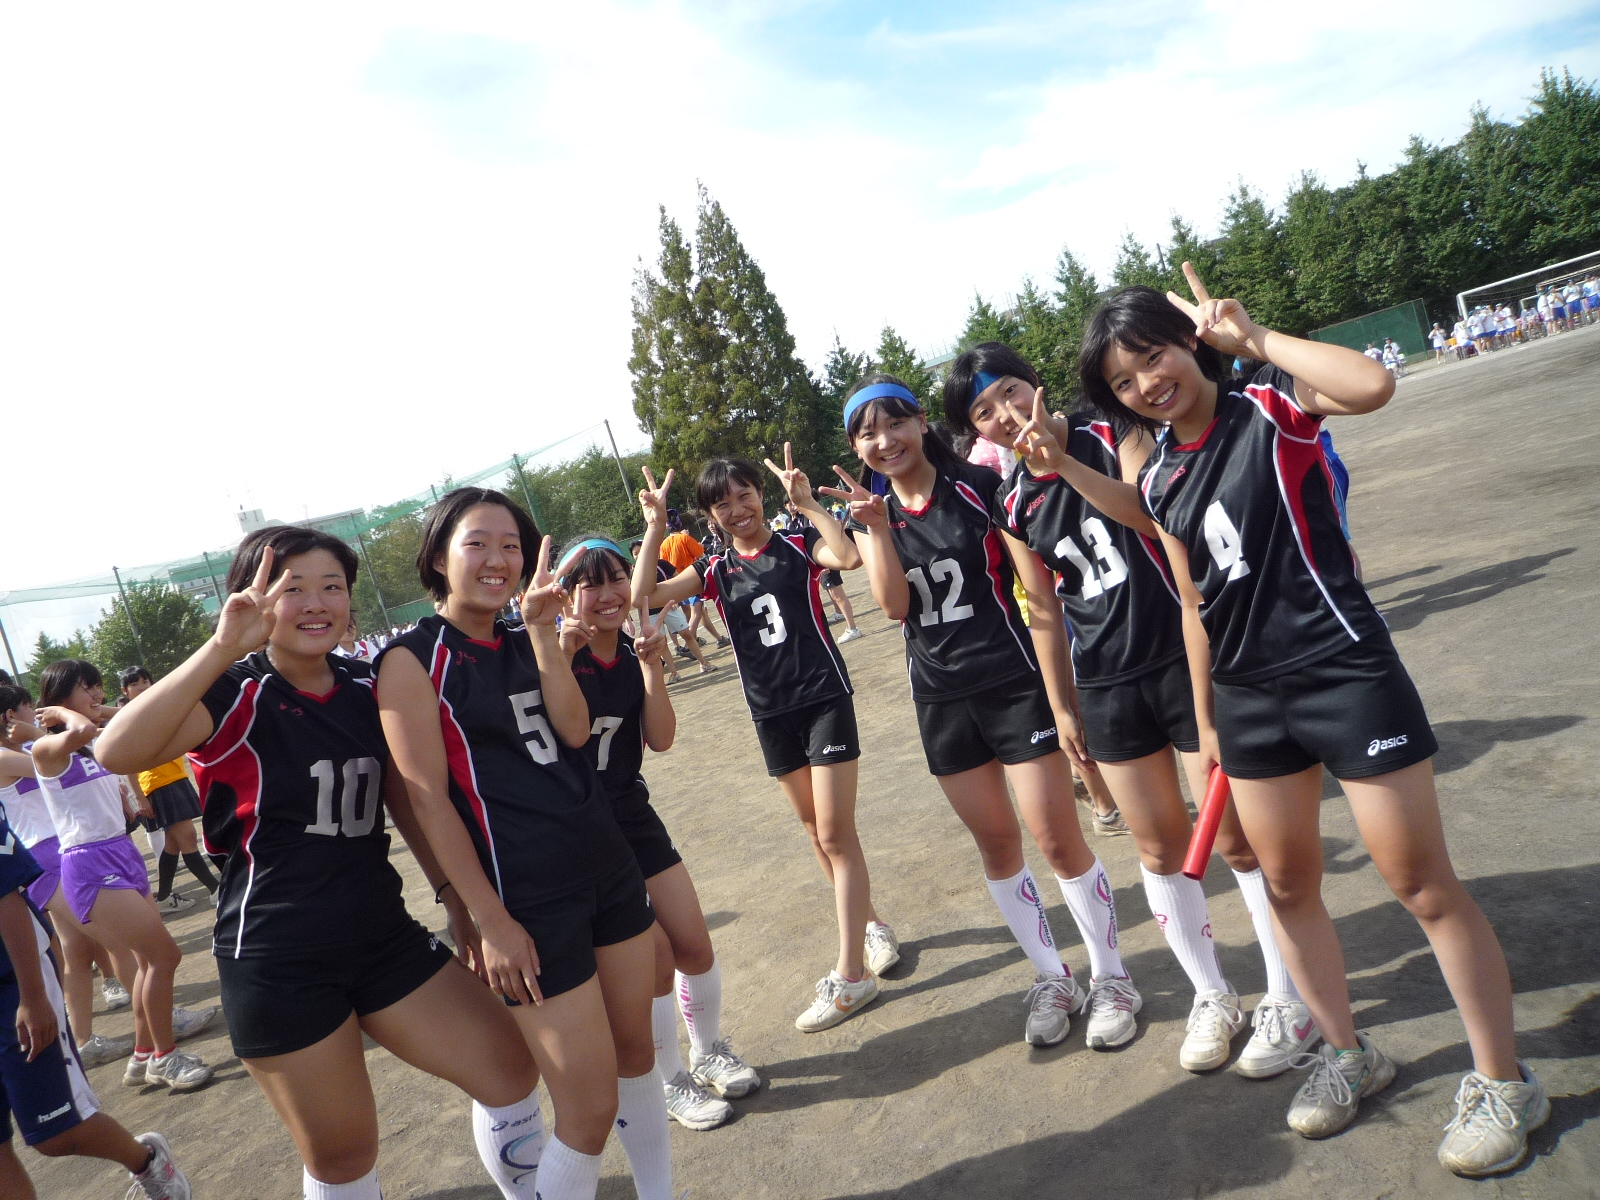 http 1 bp blogspot com -lL8zjhFJ41M UBtI5Lmum2I AAAAAAAAAbU MUEItxu0S-I s1600 NishimuraRika03 jpg